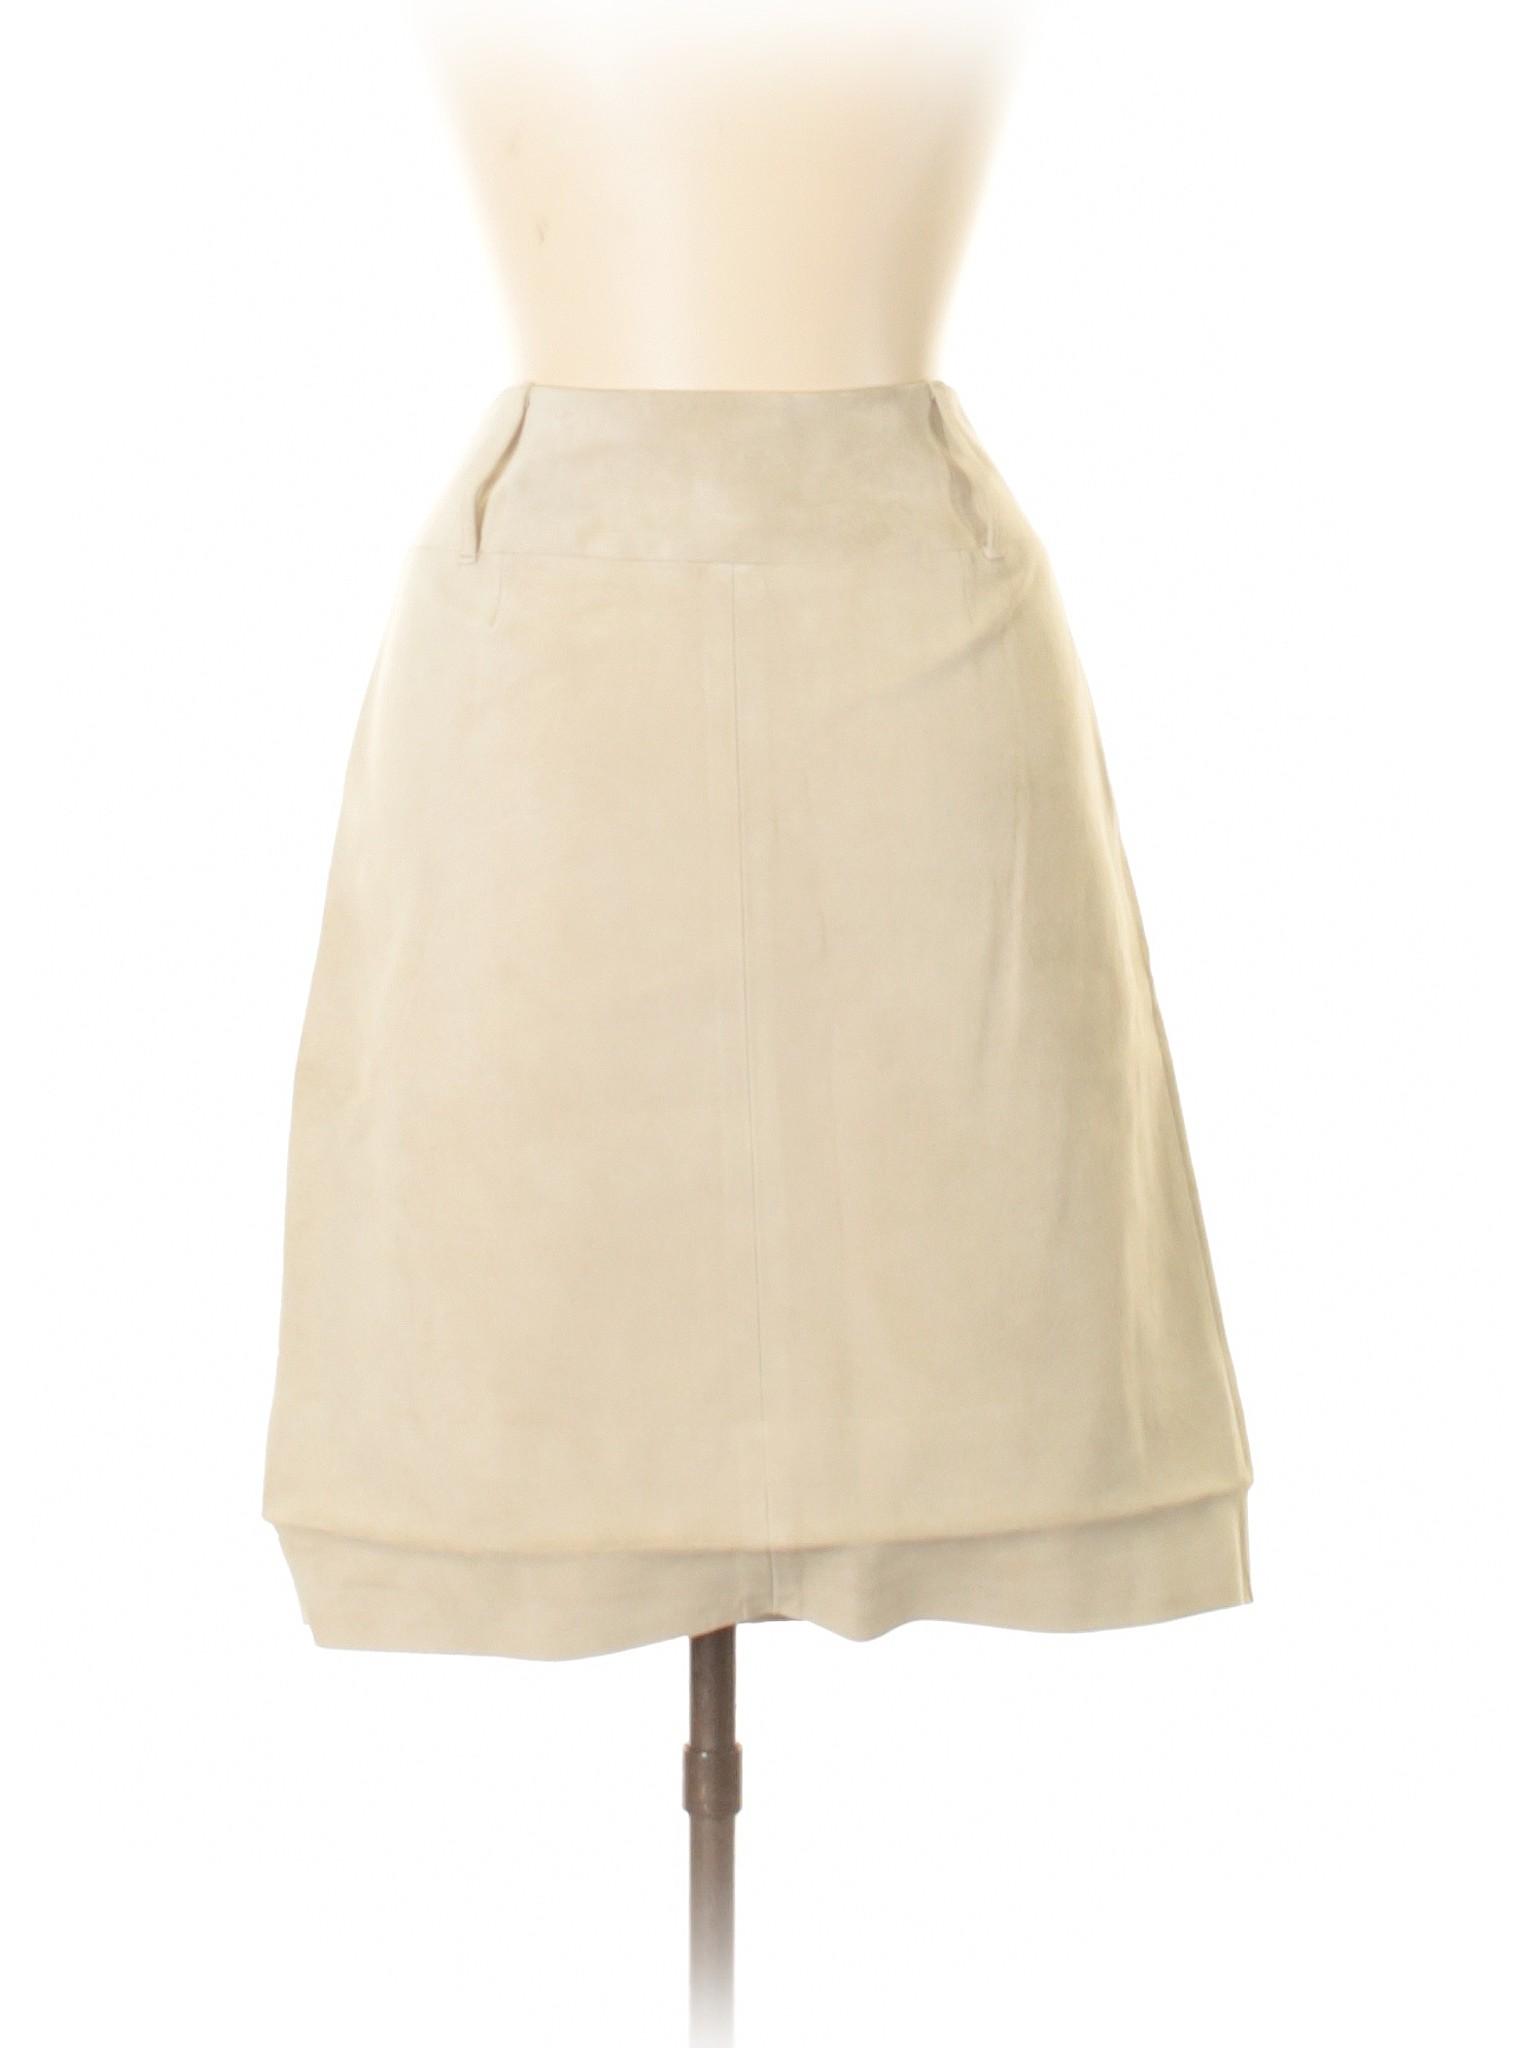 Skirt Boutique Leather Skirt Boutique Skirt Boutique Leather Leather 0pRxZUq